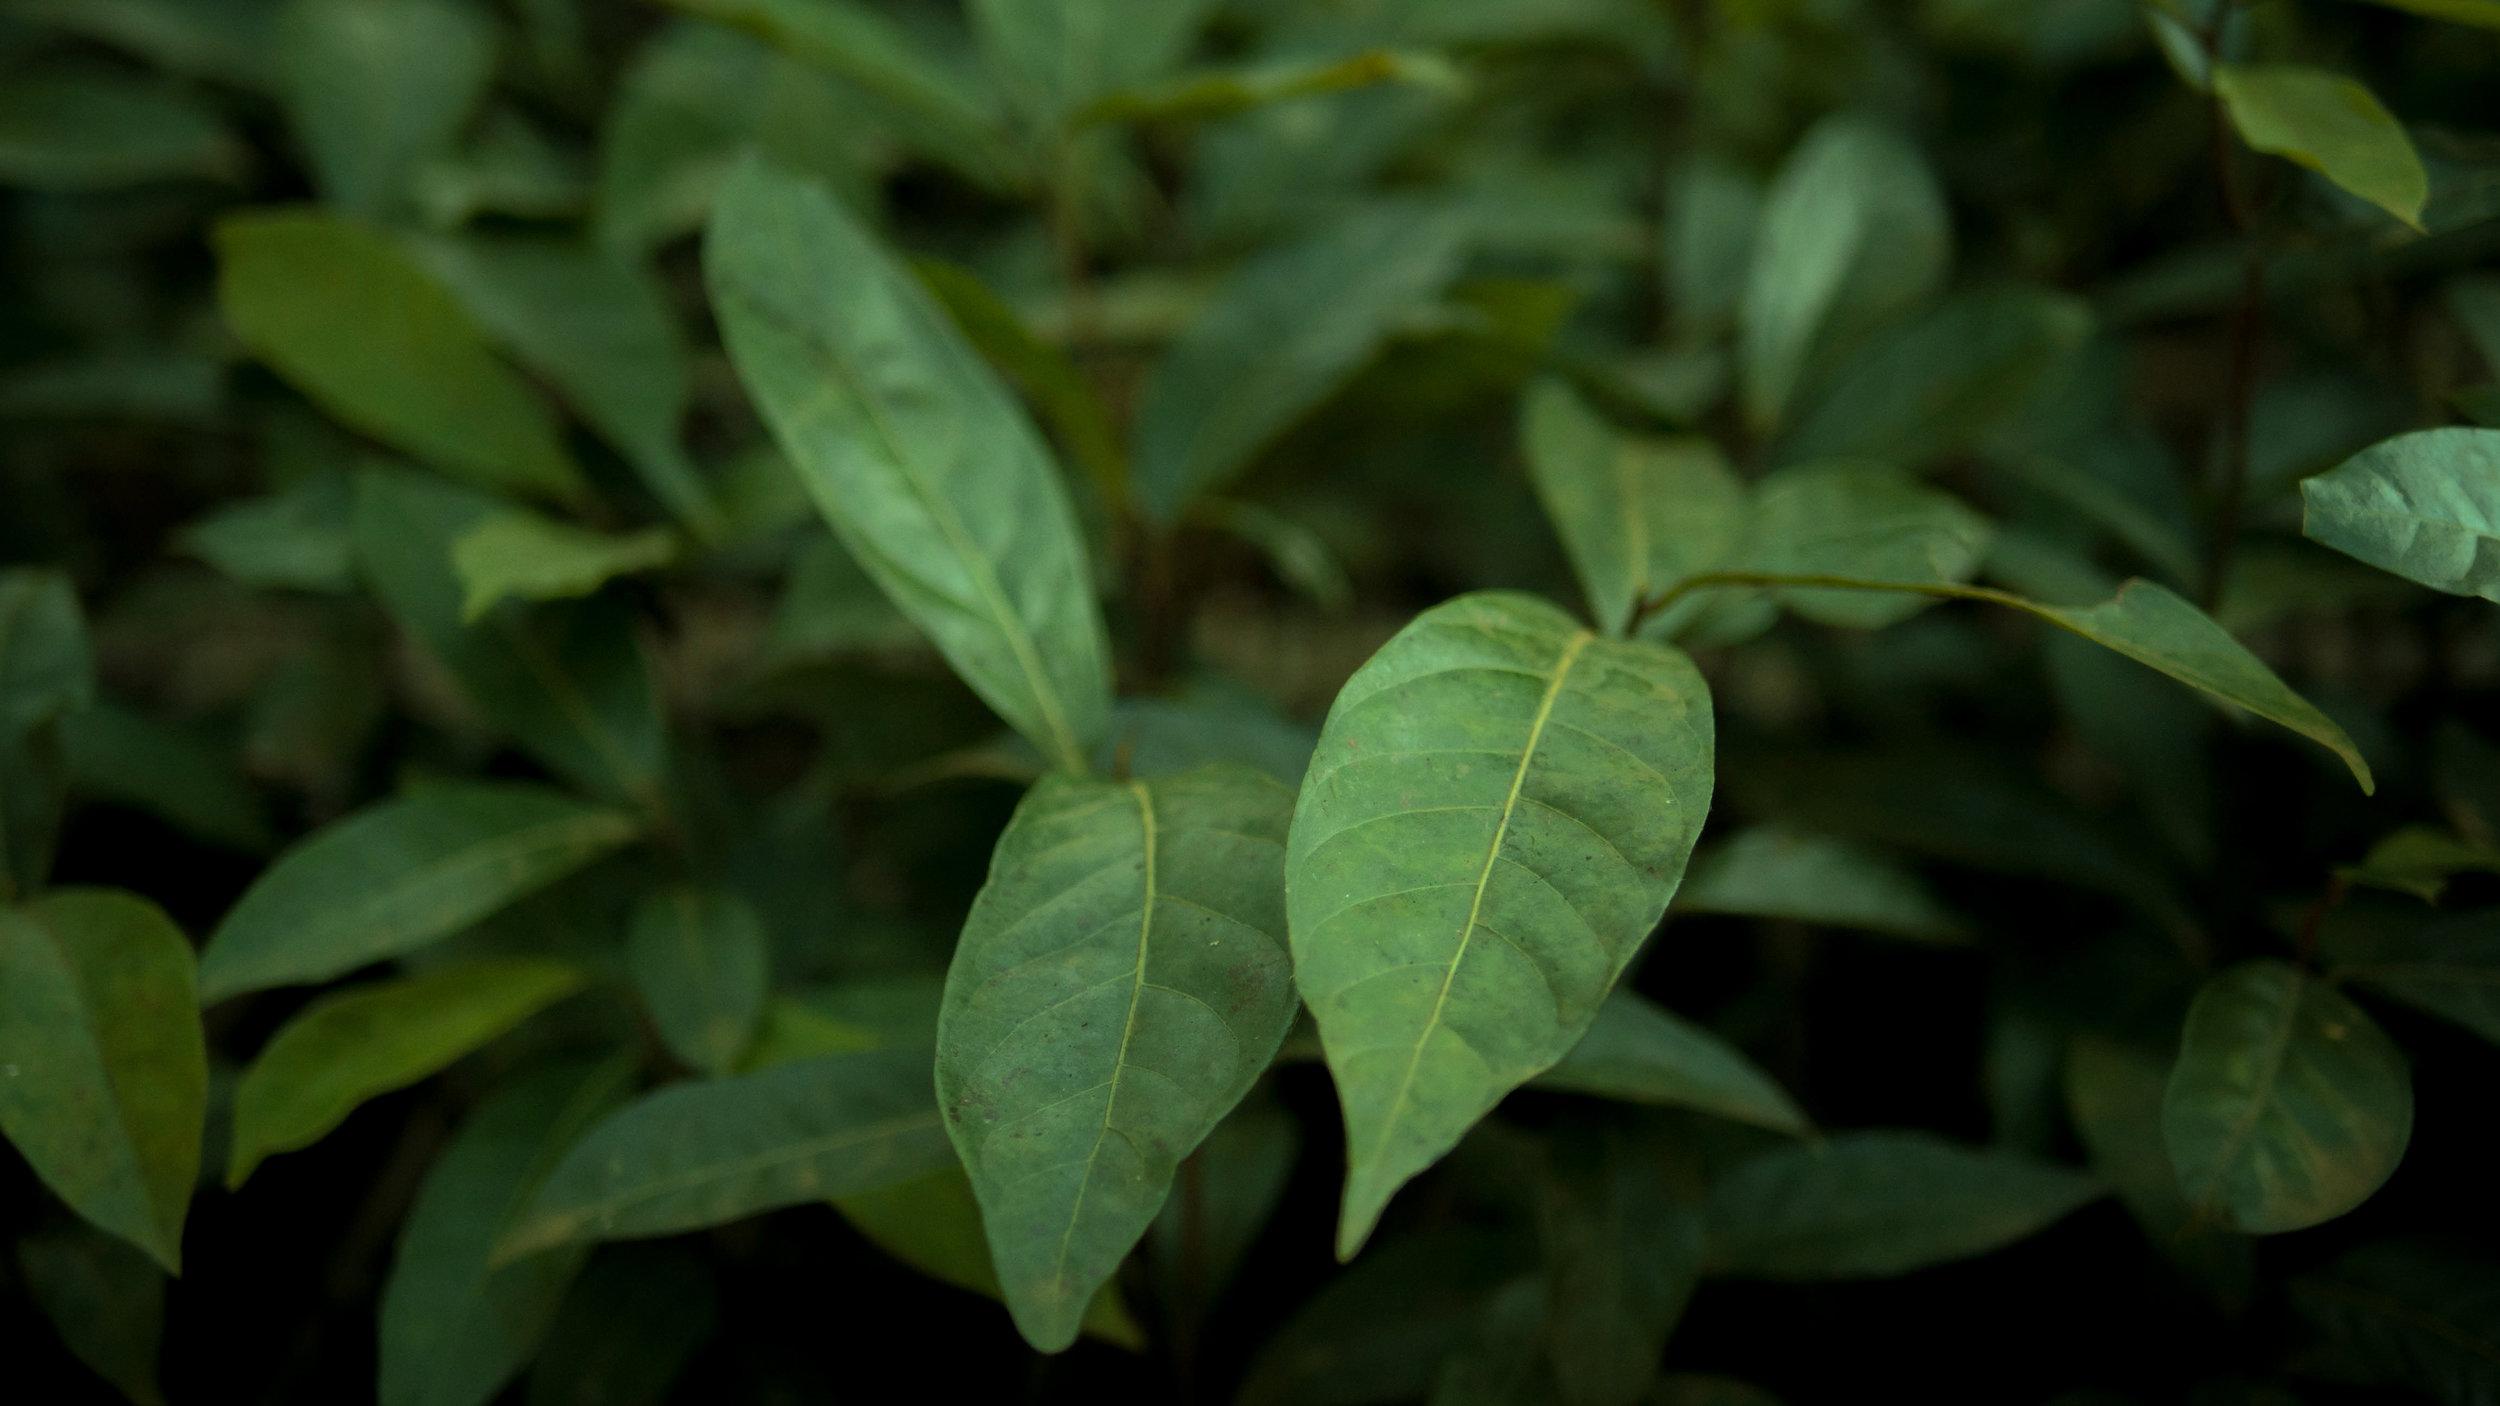 Moena leaves